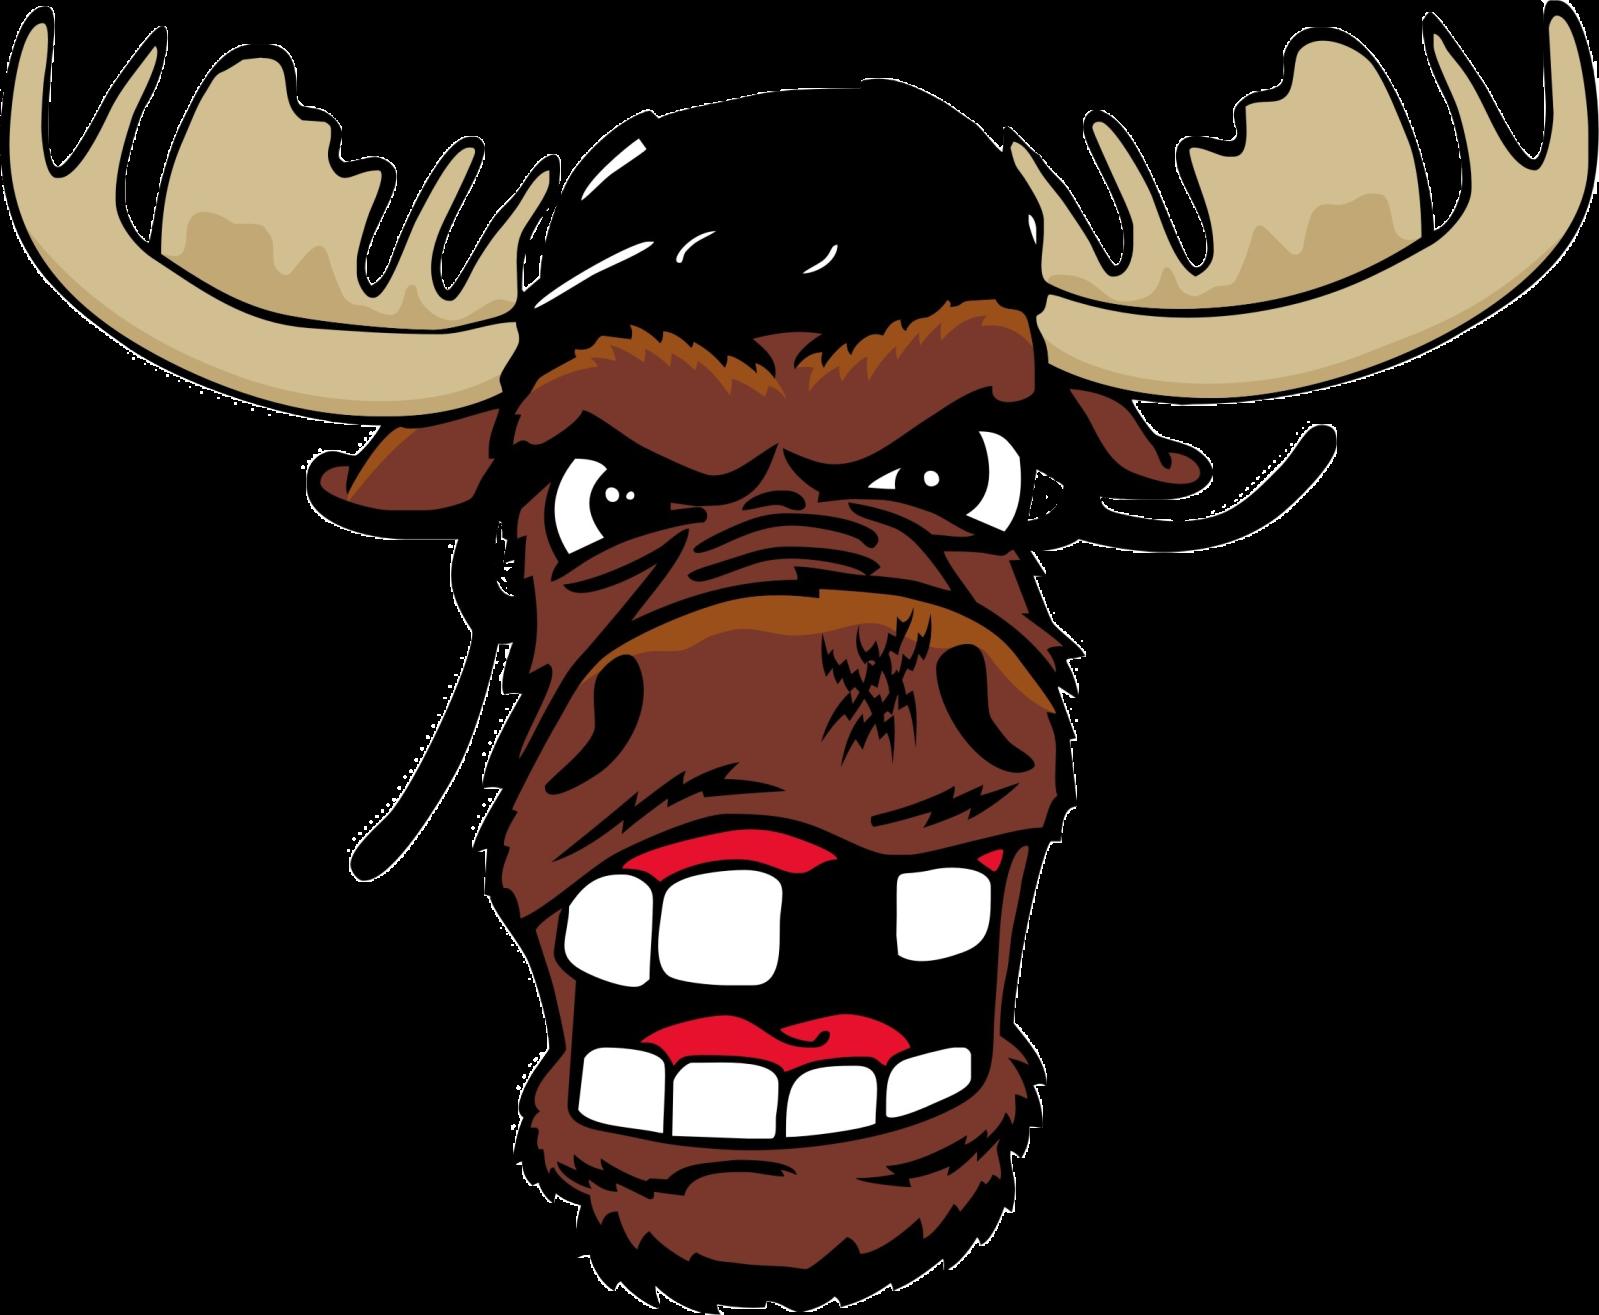 Līgas un Komandu logo 2d2bx1f